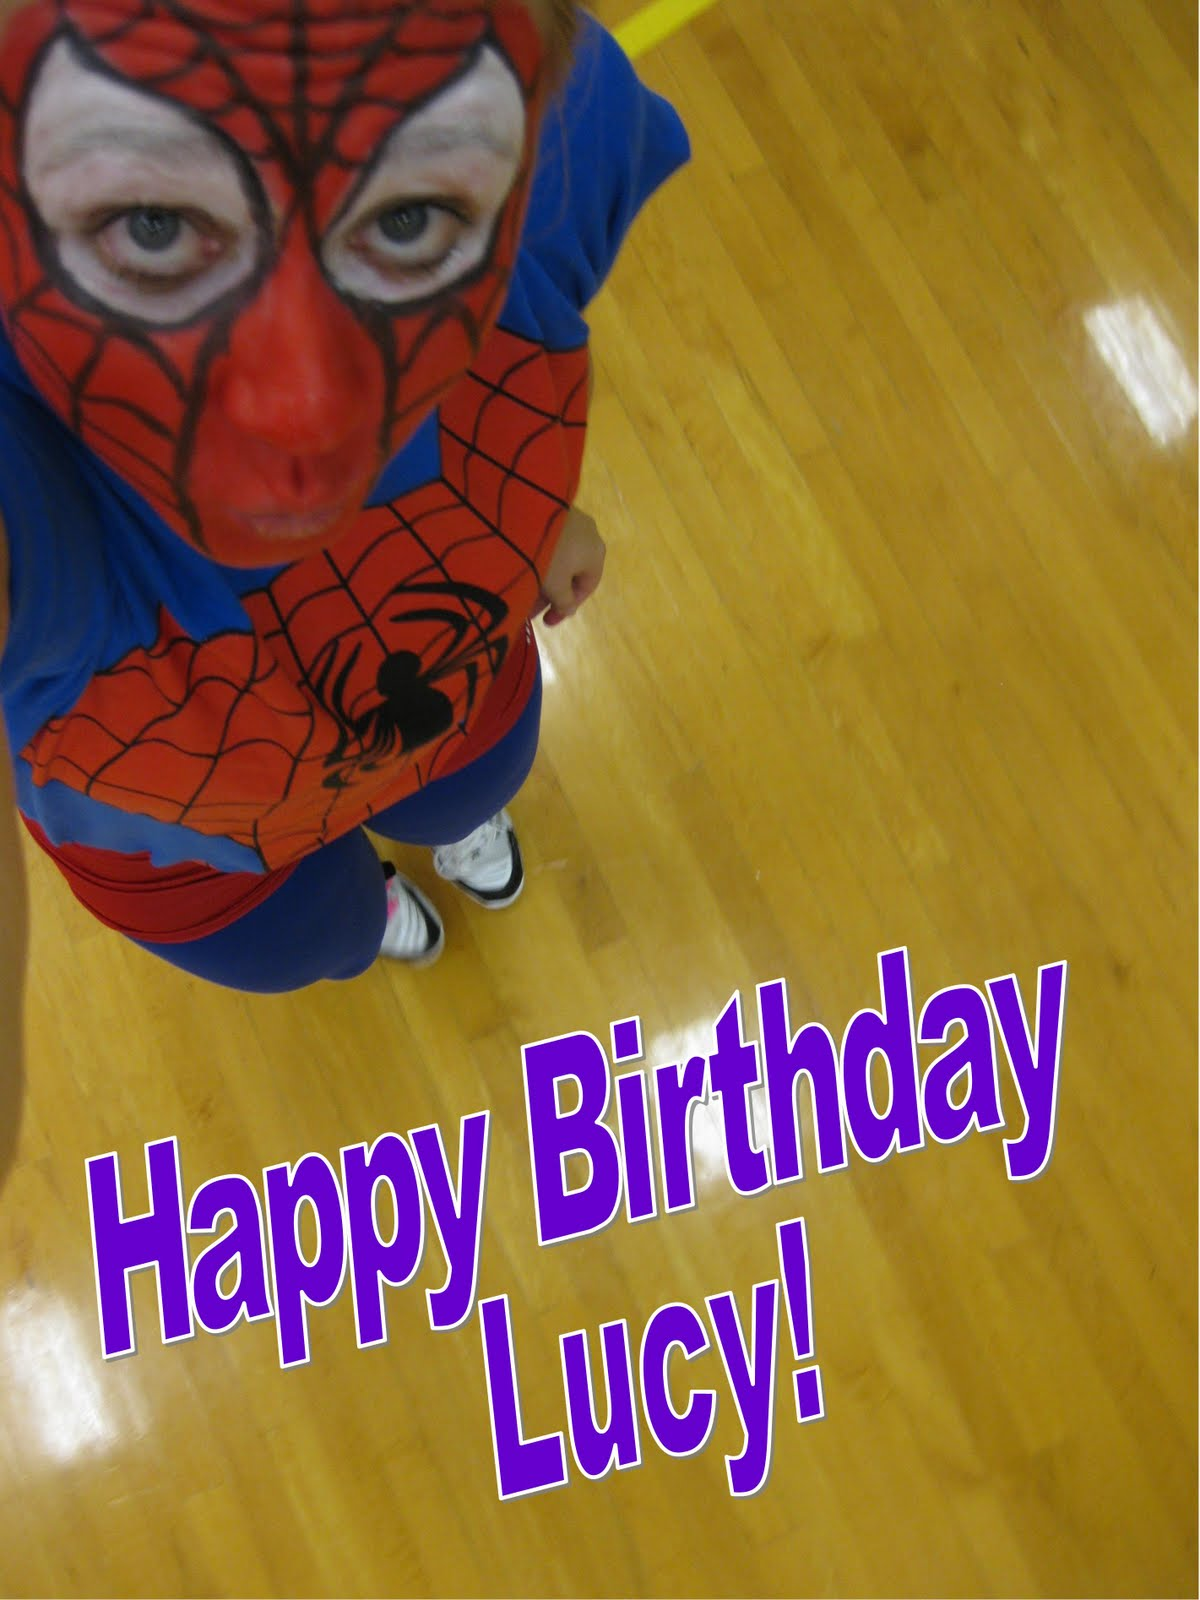 saint leo university volleyball  happy birthday lucy